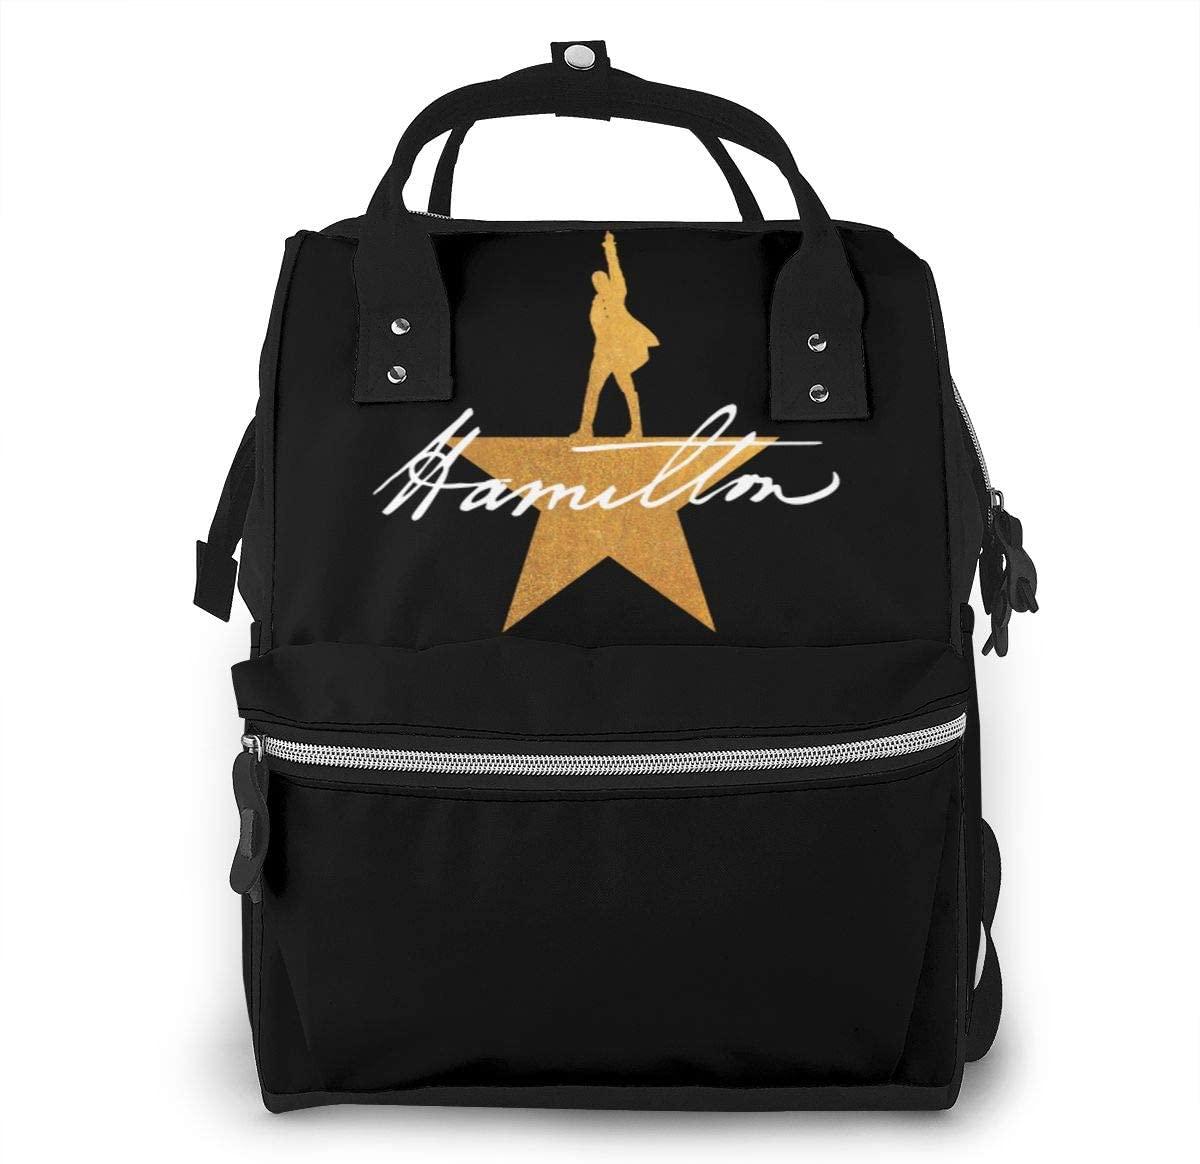 10sdaklasd Musicals Hamilton Diaper Backpack Large Capacity Multi-Function Travel Bag